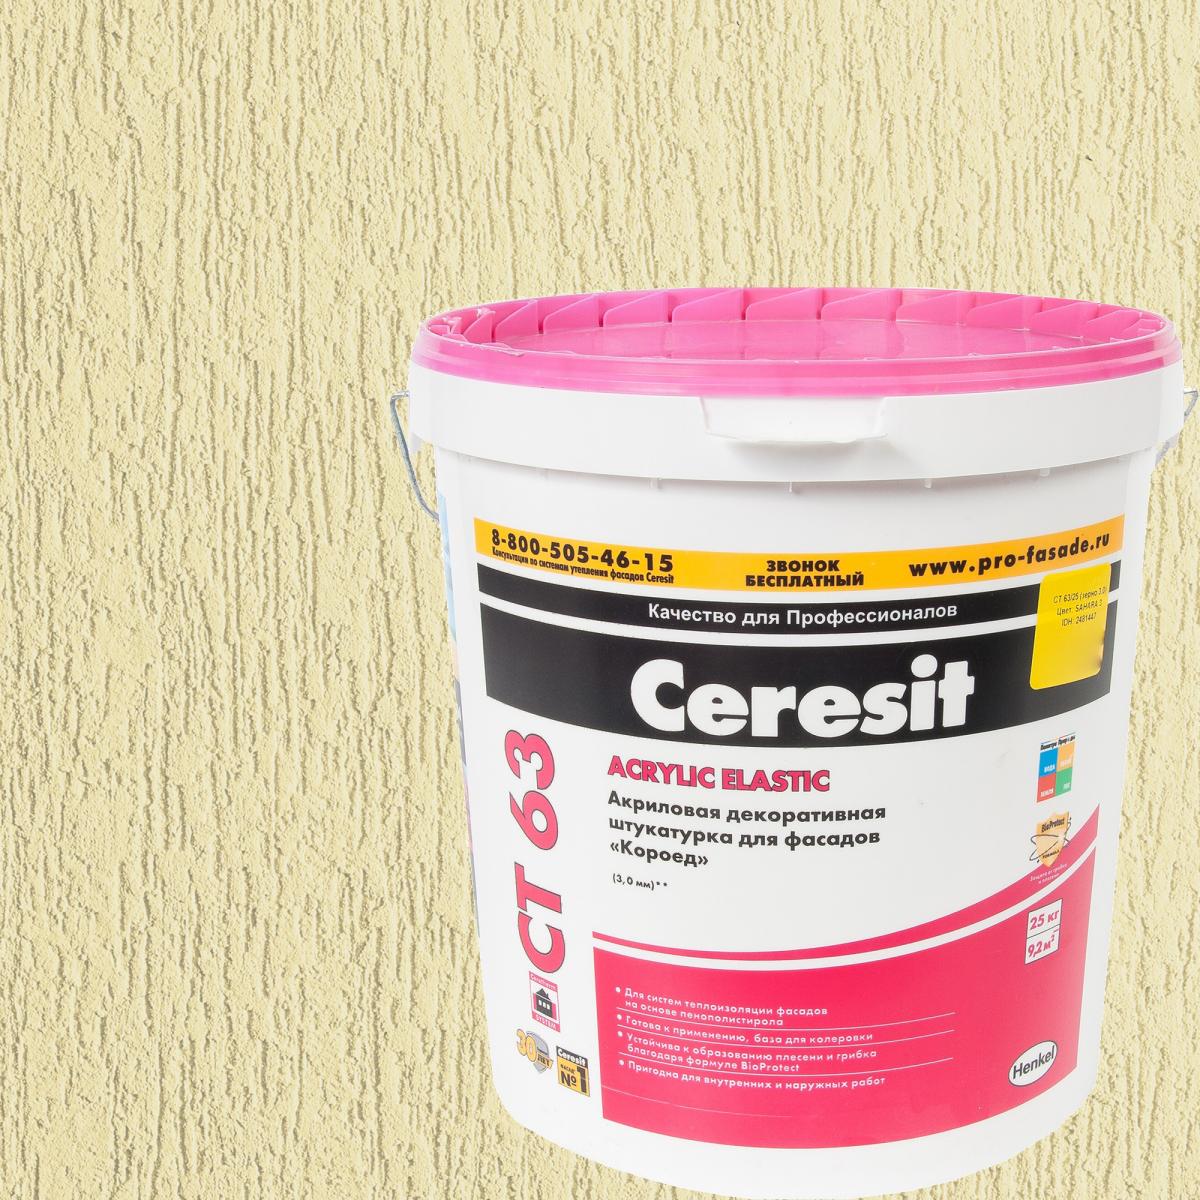 Штукатурка декоративная Ceresit CT63 Sahara 3 короед 3.0 мм 25 кг